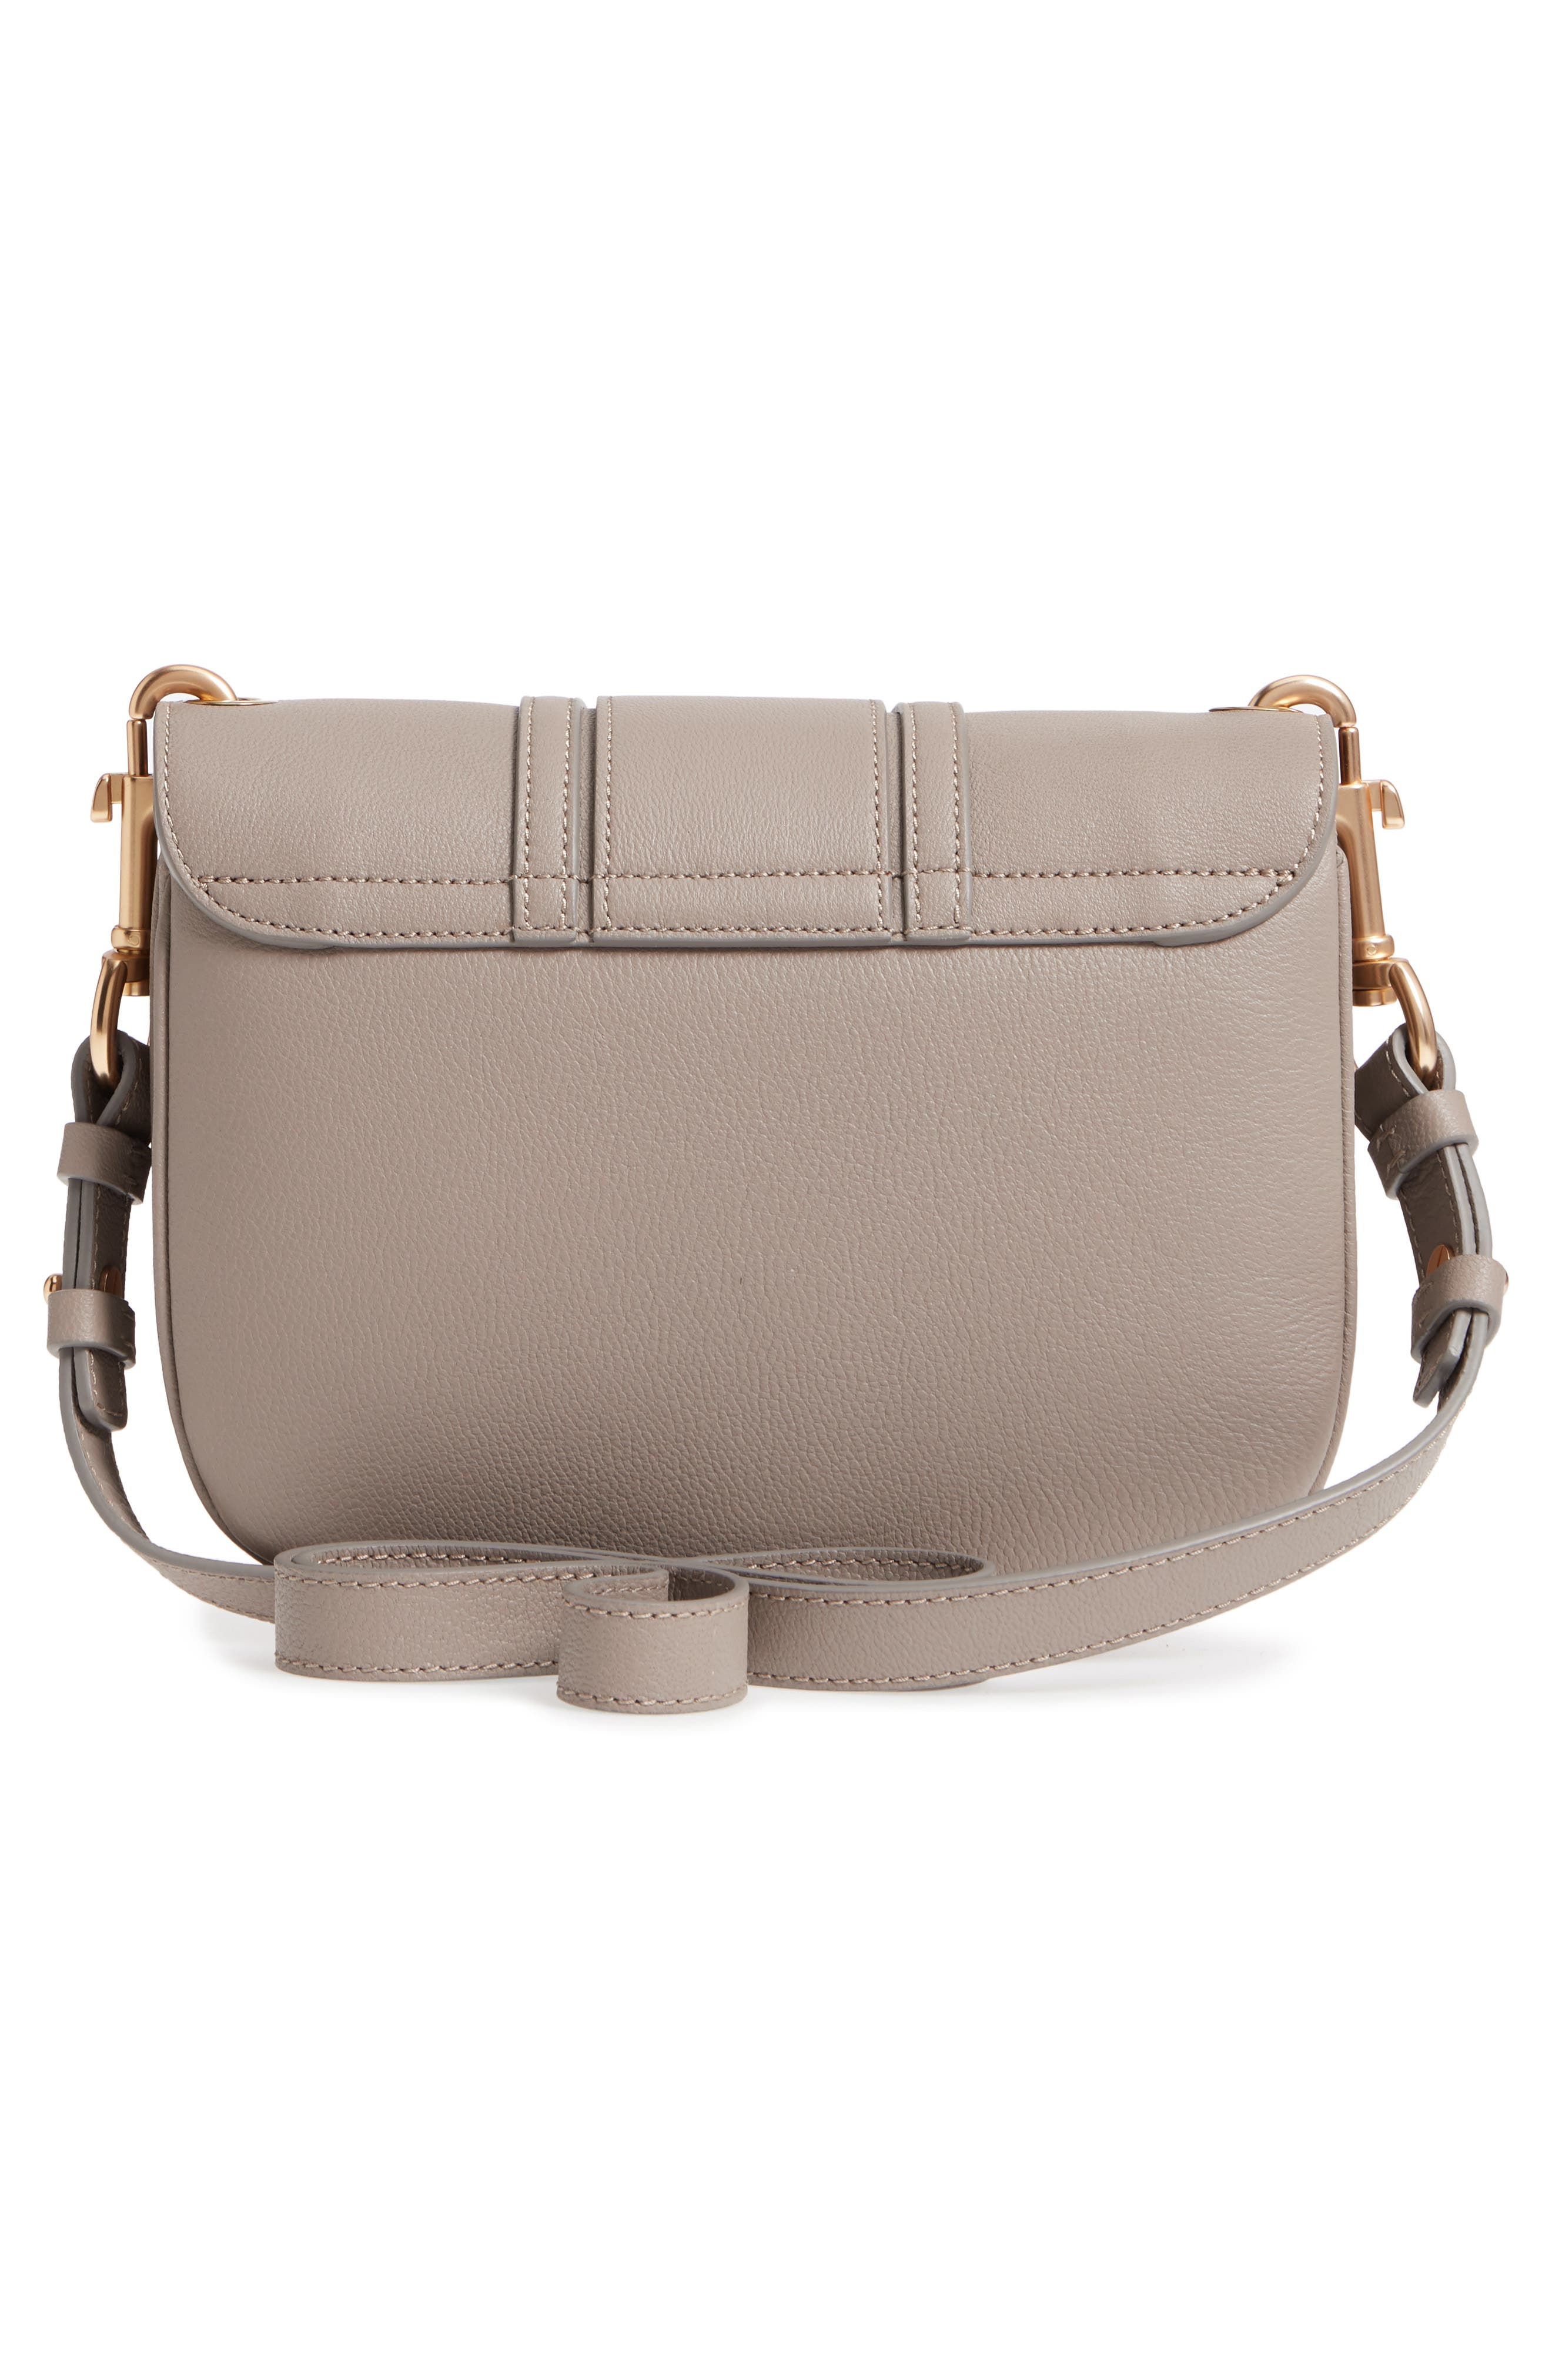 Hana Small Leather Crossbody Bag,                             Alternate thumbnail 3, color,                             Motty Grey